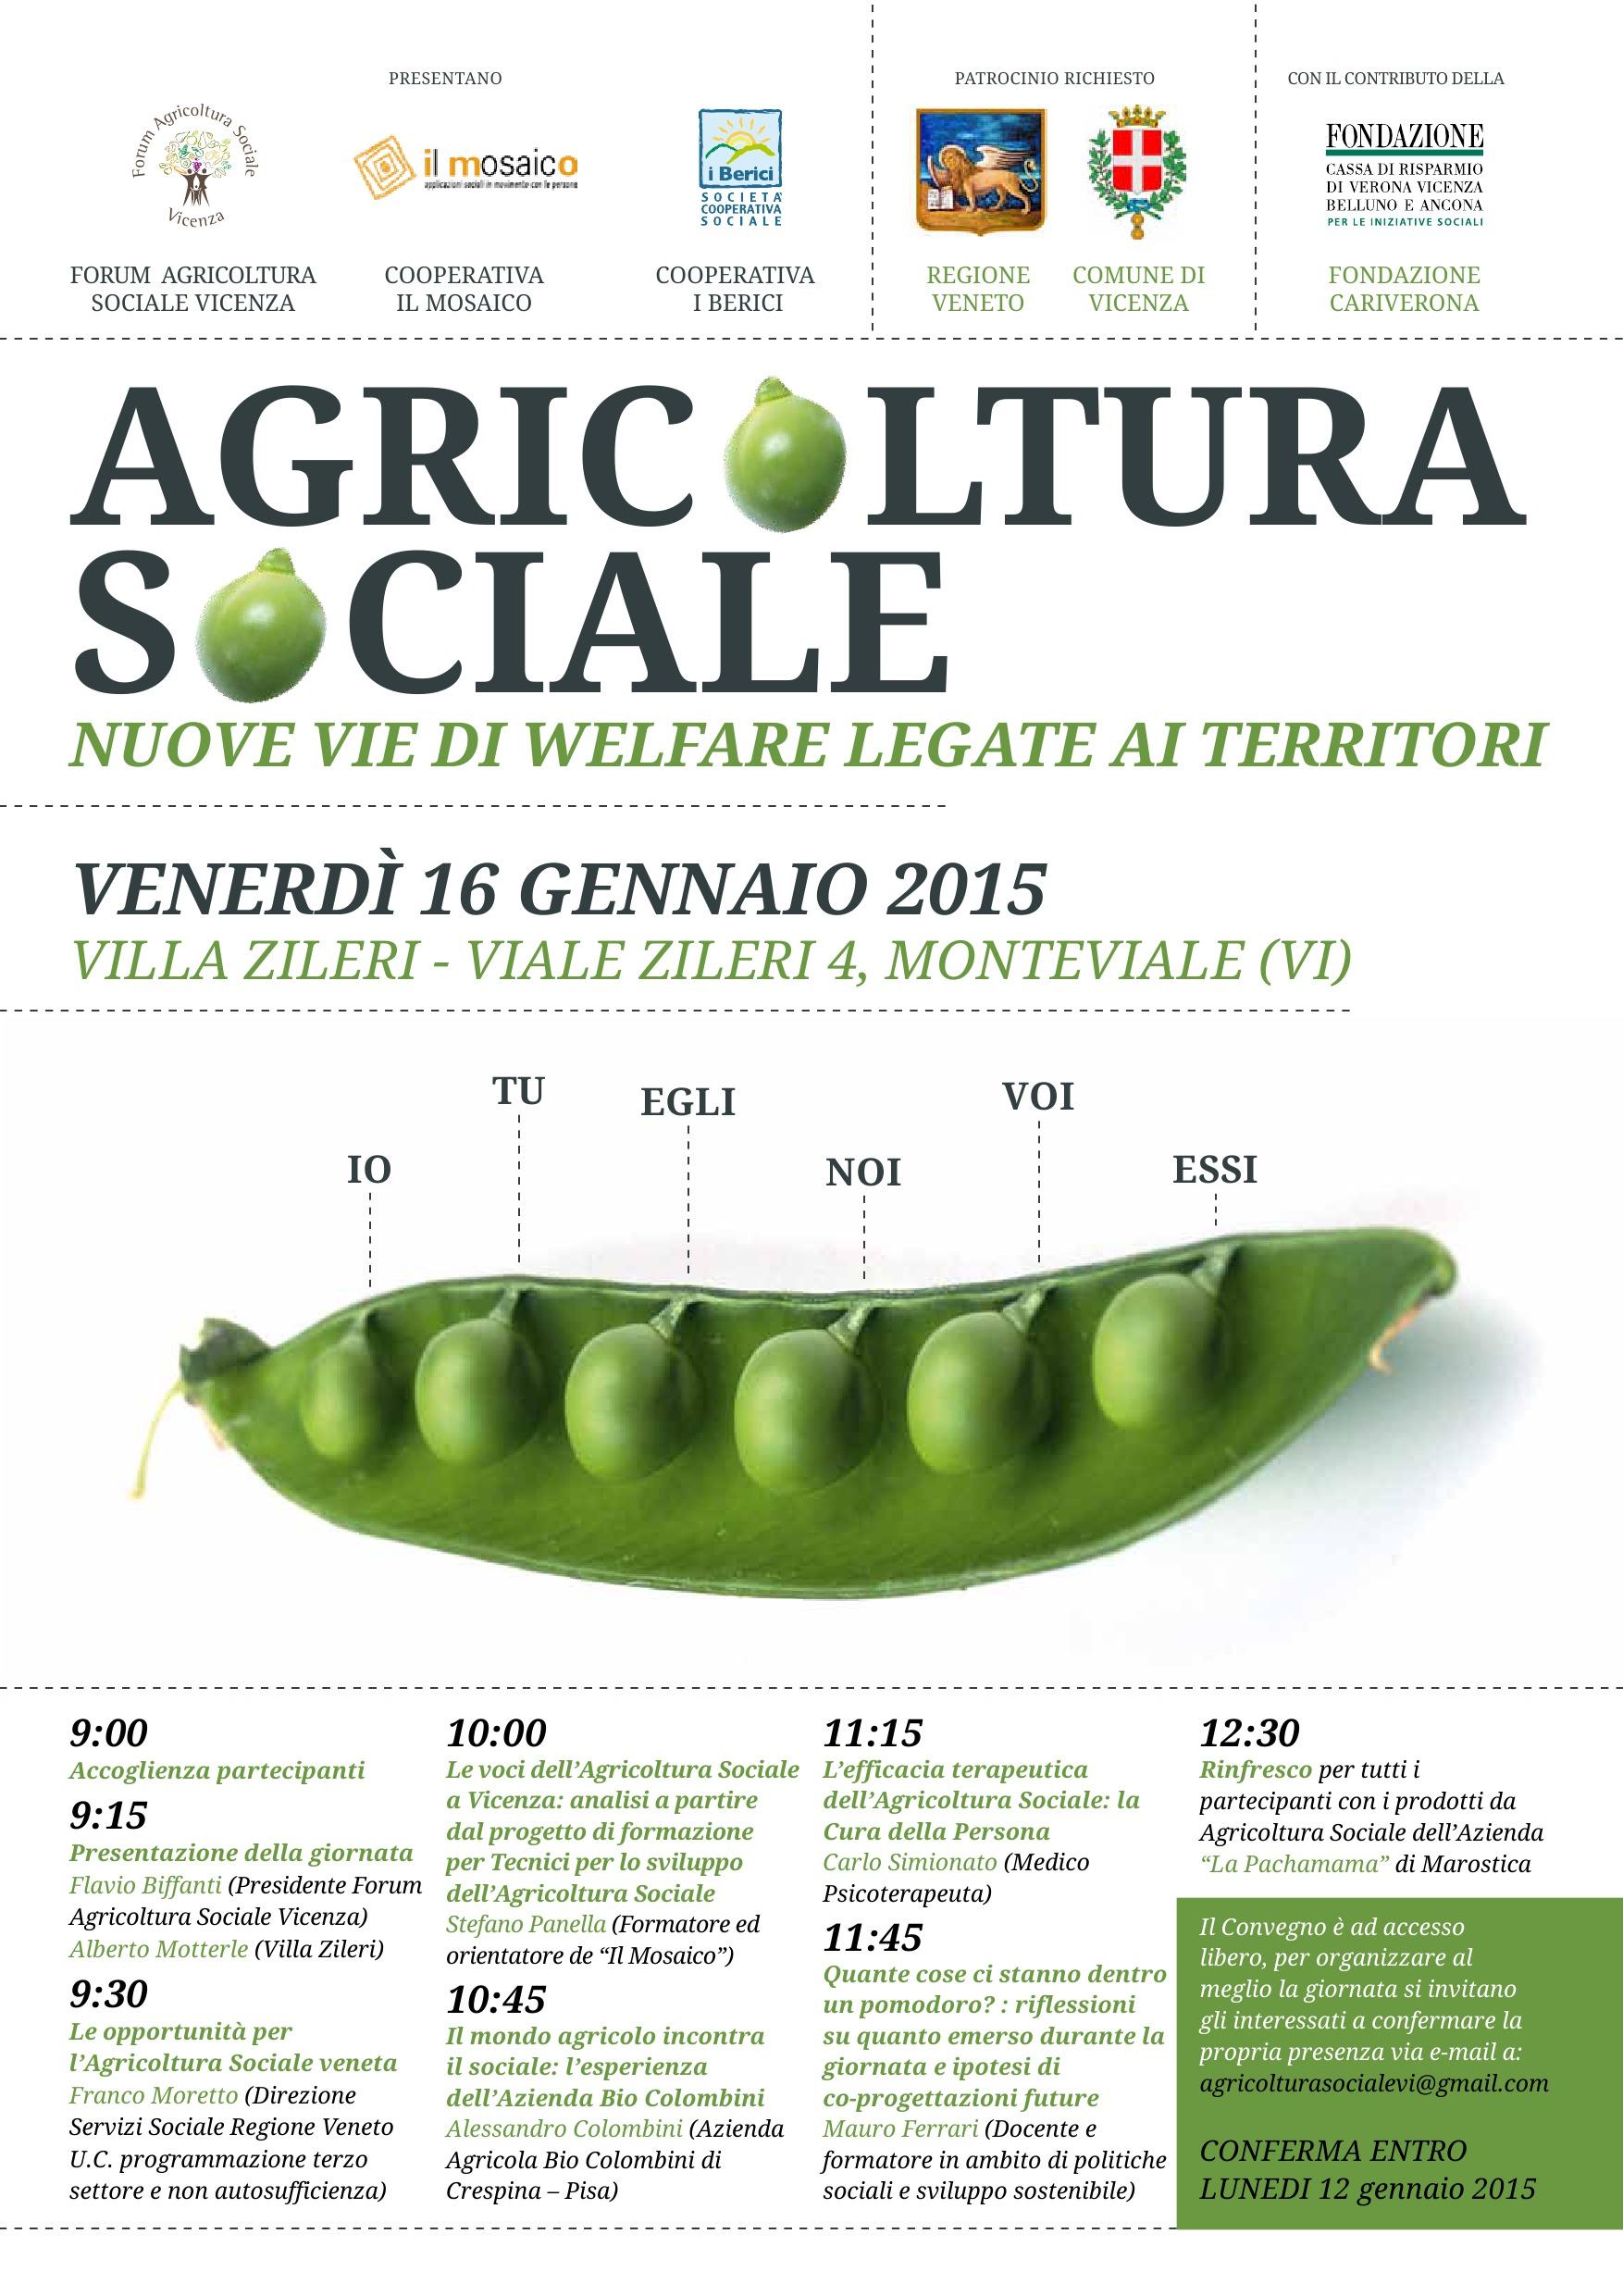 #AgricolturaSociale #welfare